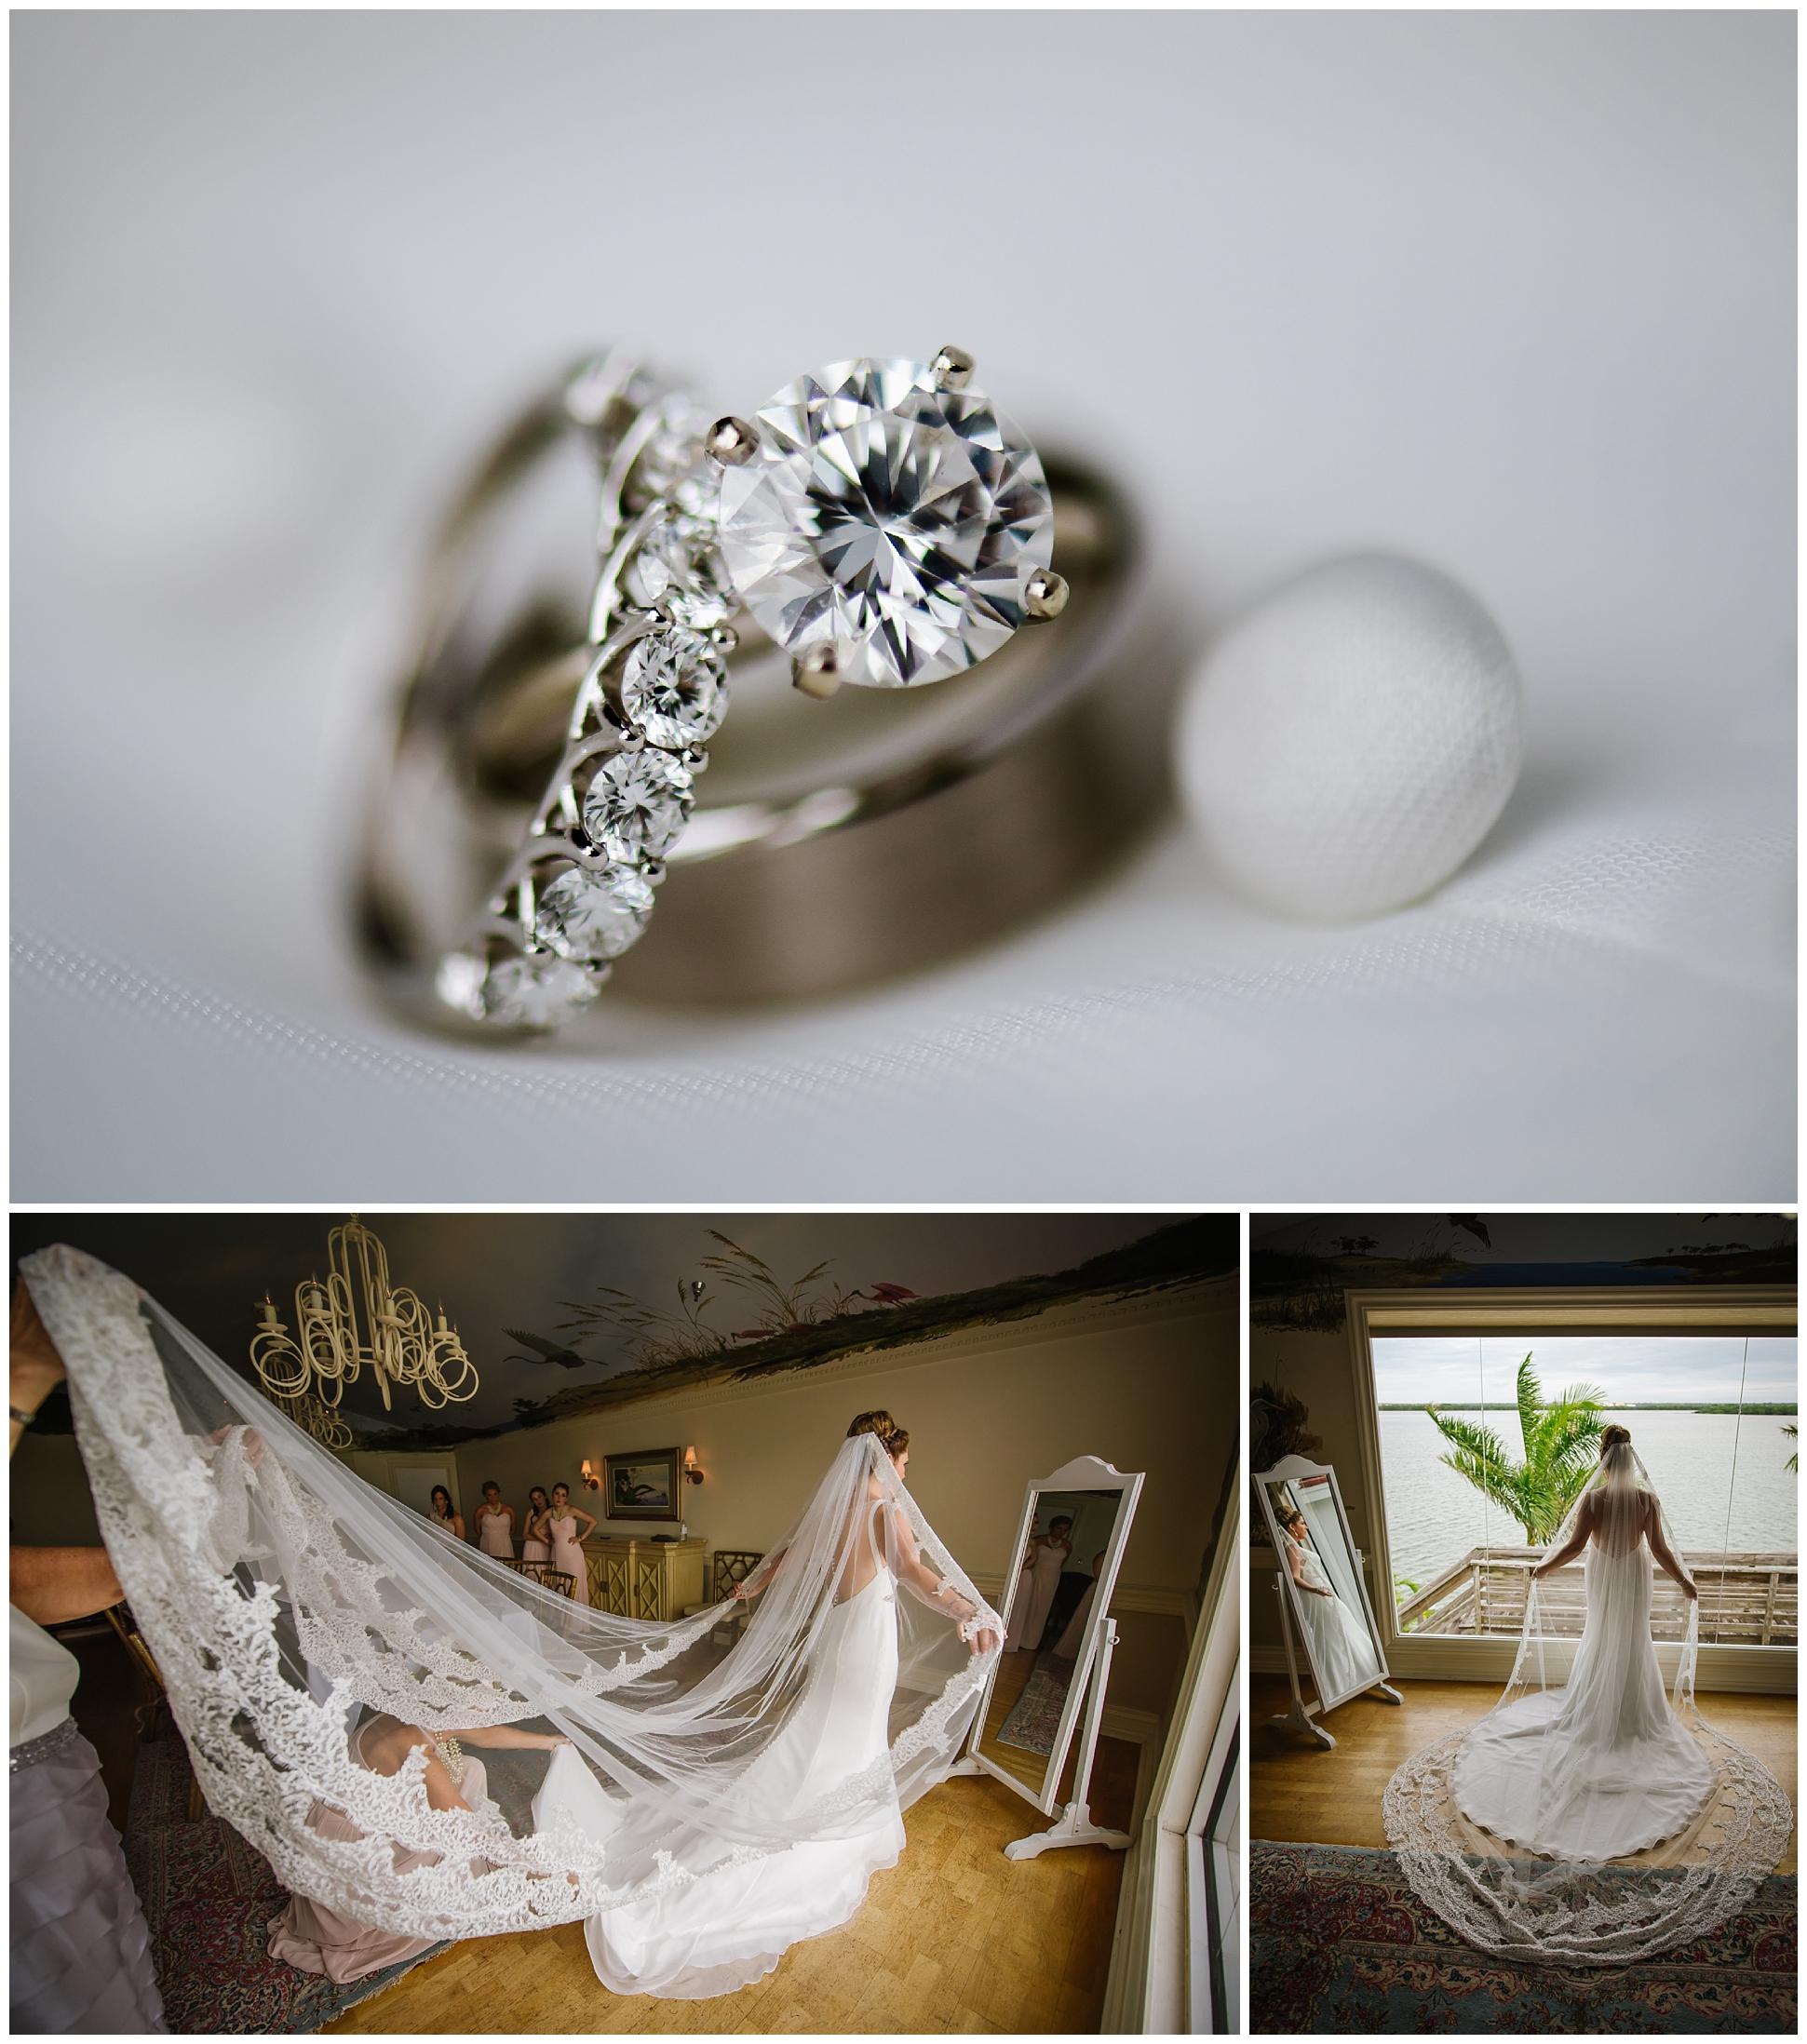 Ashlee-hamon-photography-year-in-review-2016-travel-wanderlust-vsco-adventure-wedding_0030.jpg